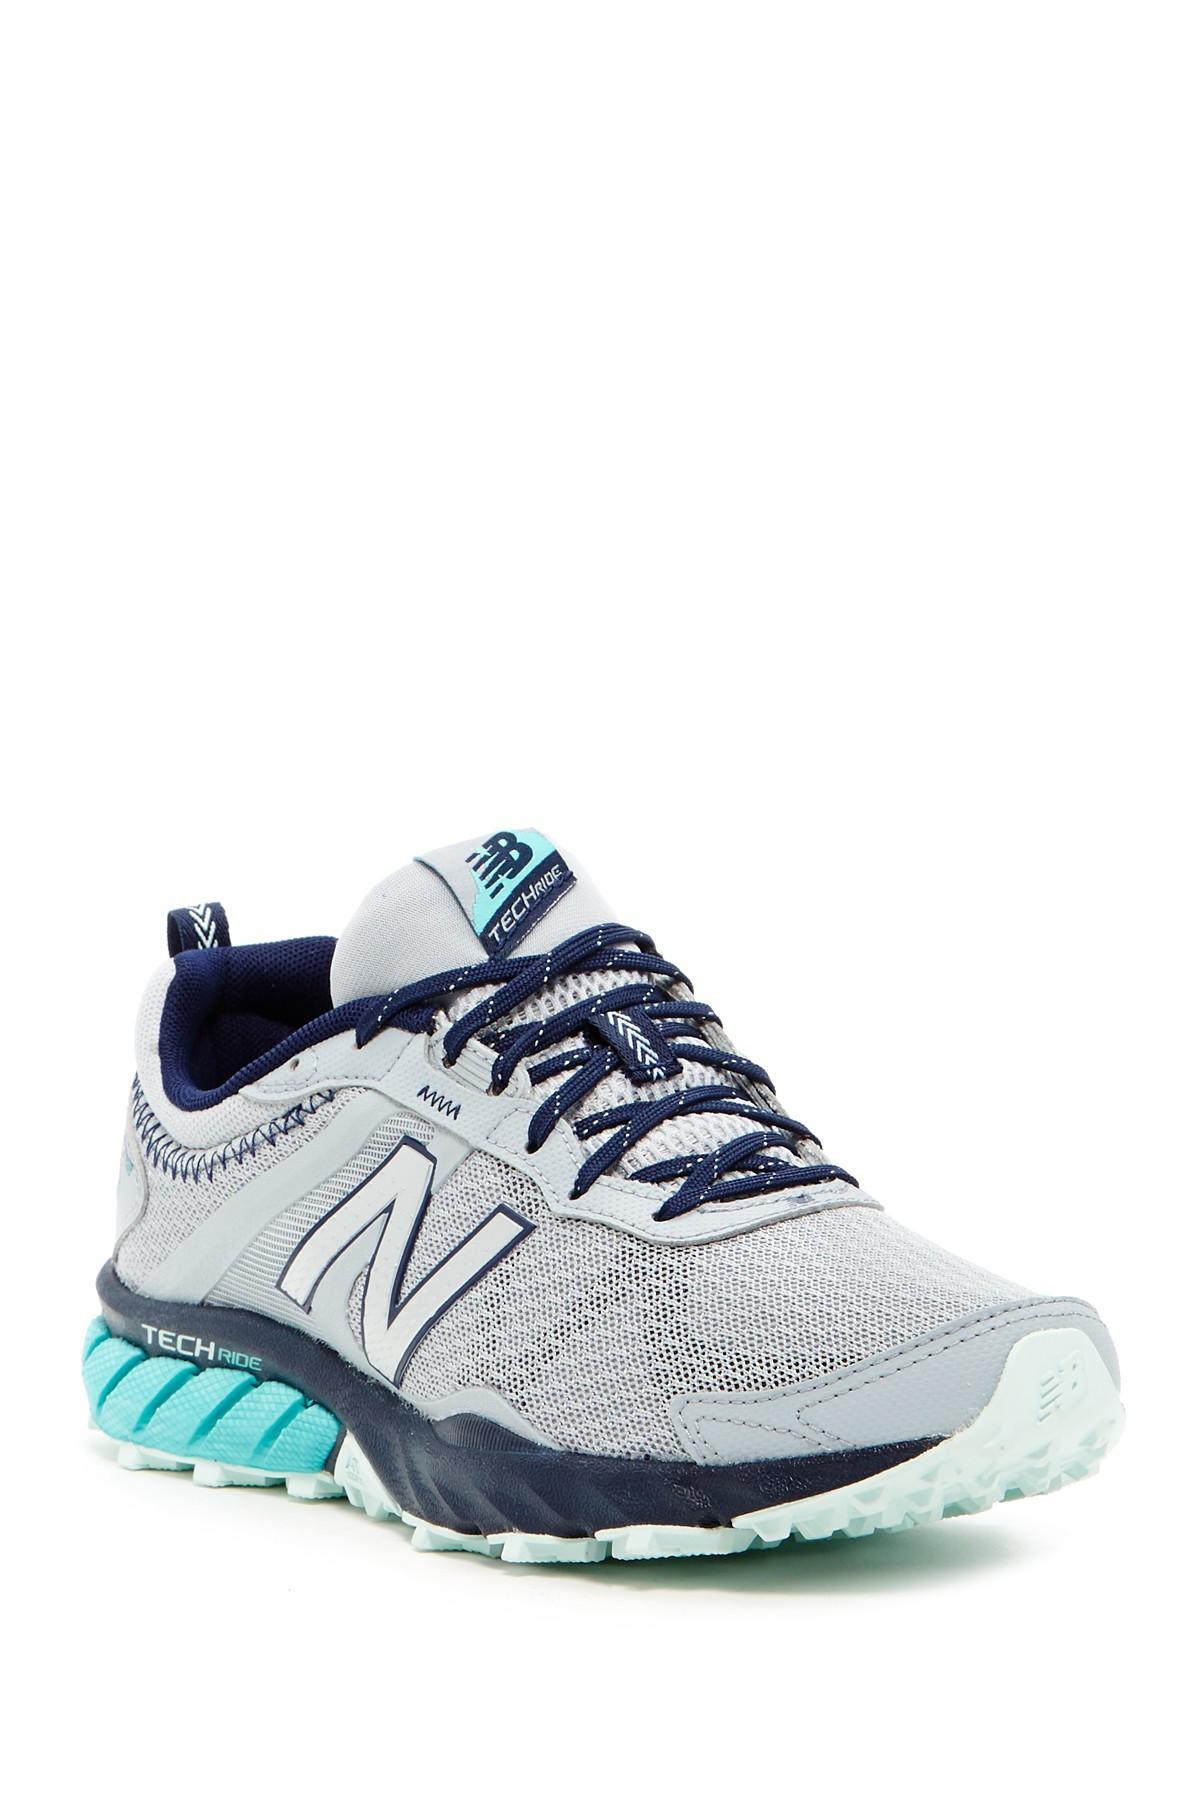 New Balance Women S Narrow Work Shoes